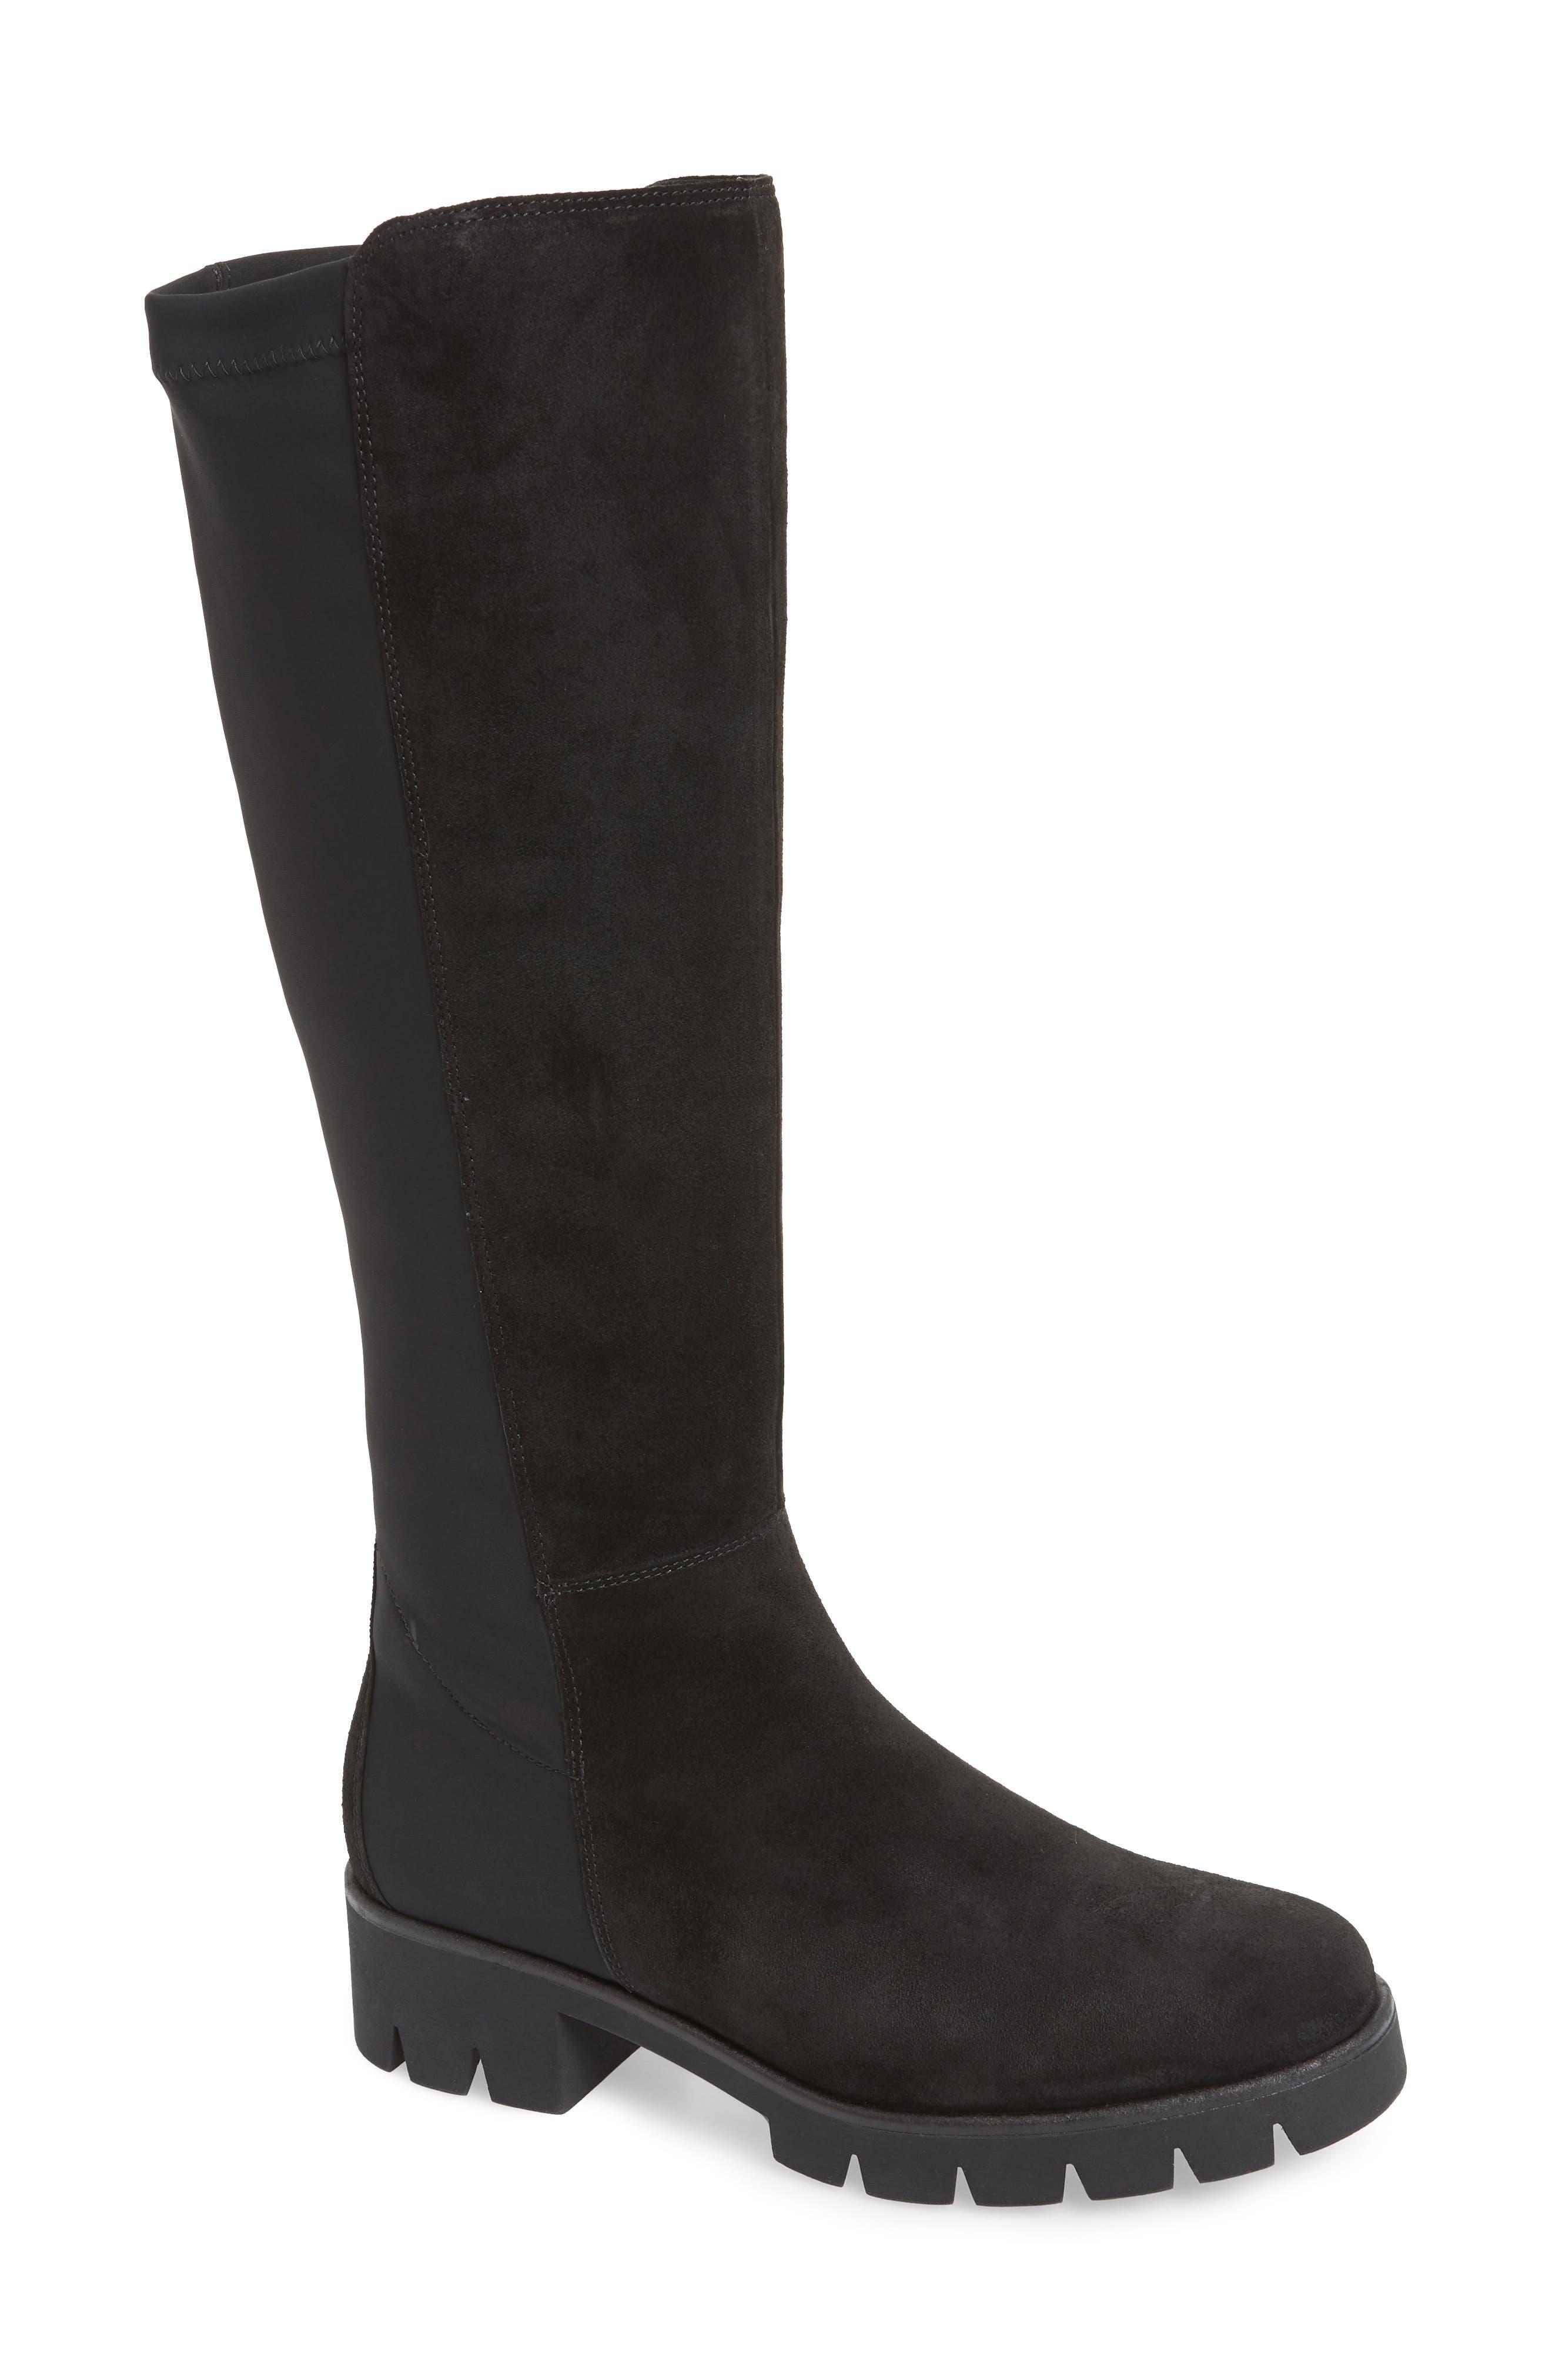 Gabor Ultimate Fashion Comfort Knee High Boot- Black